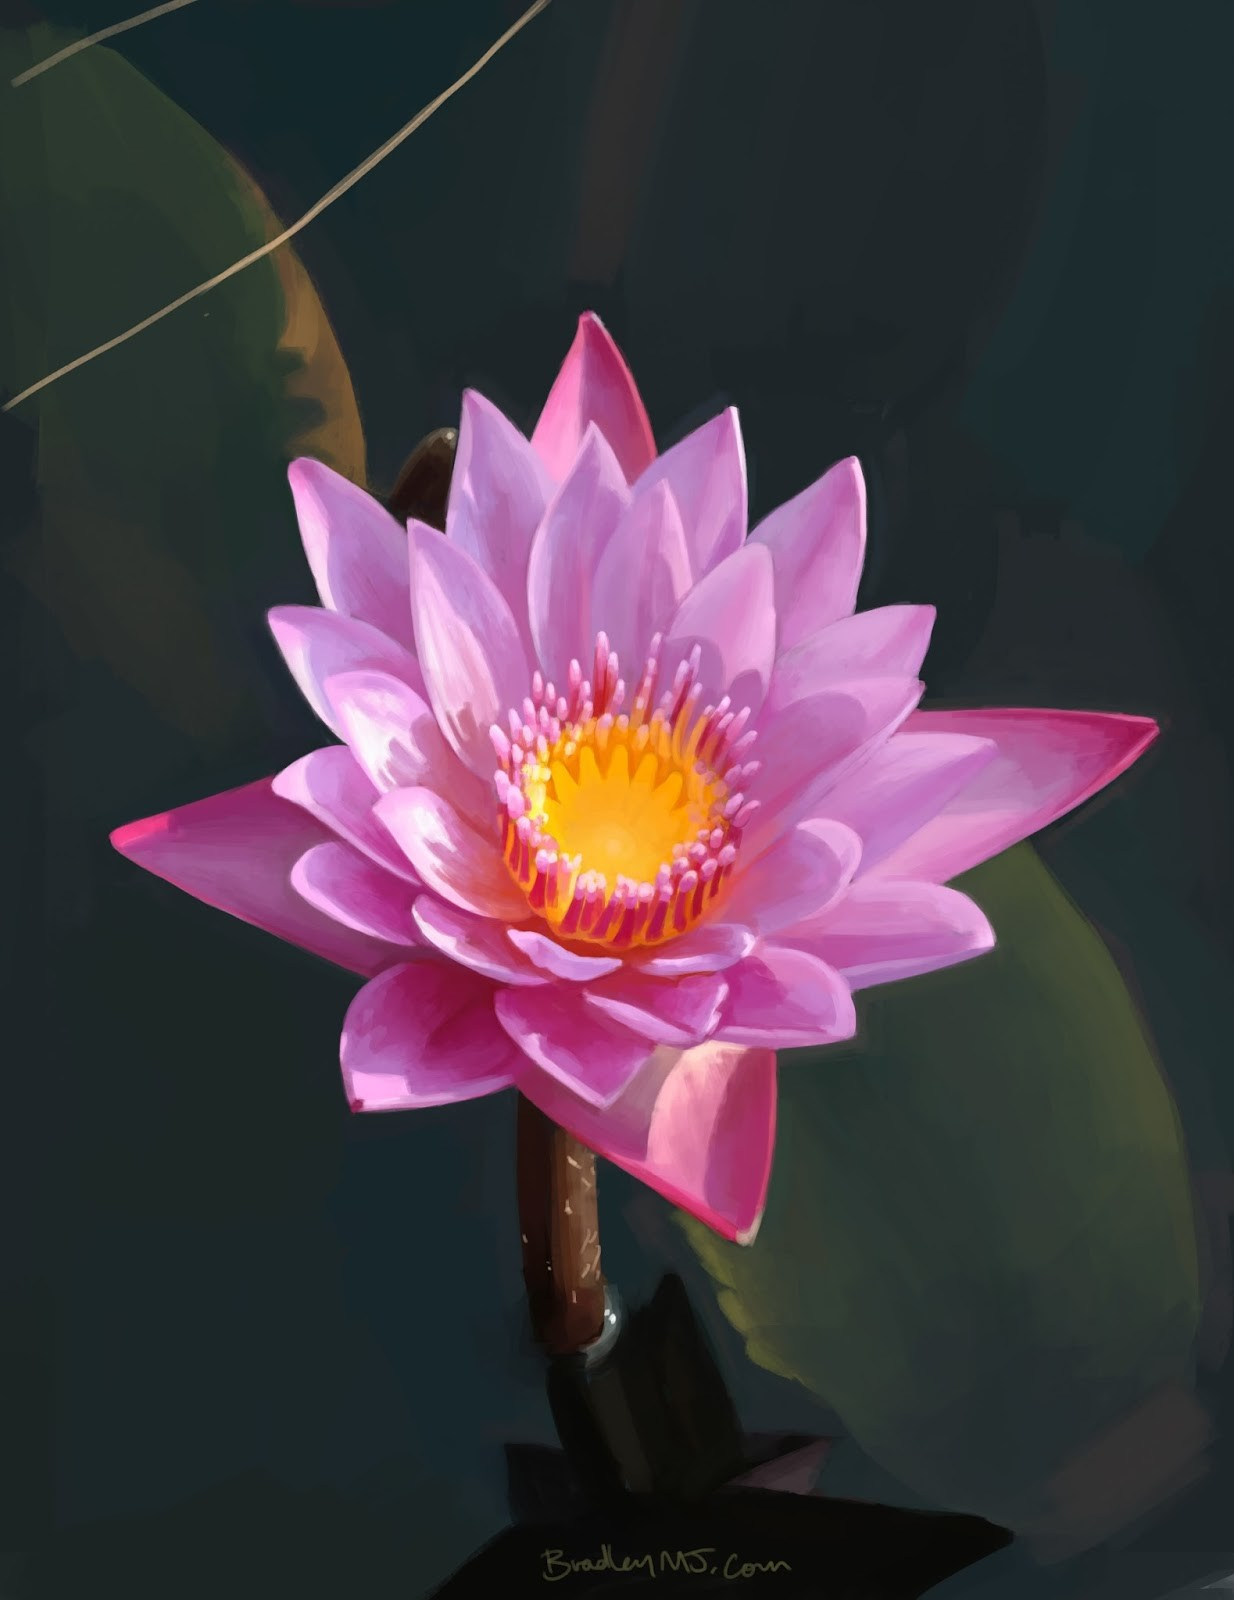 Lotus flower study